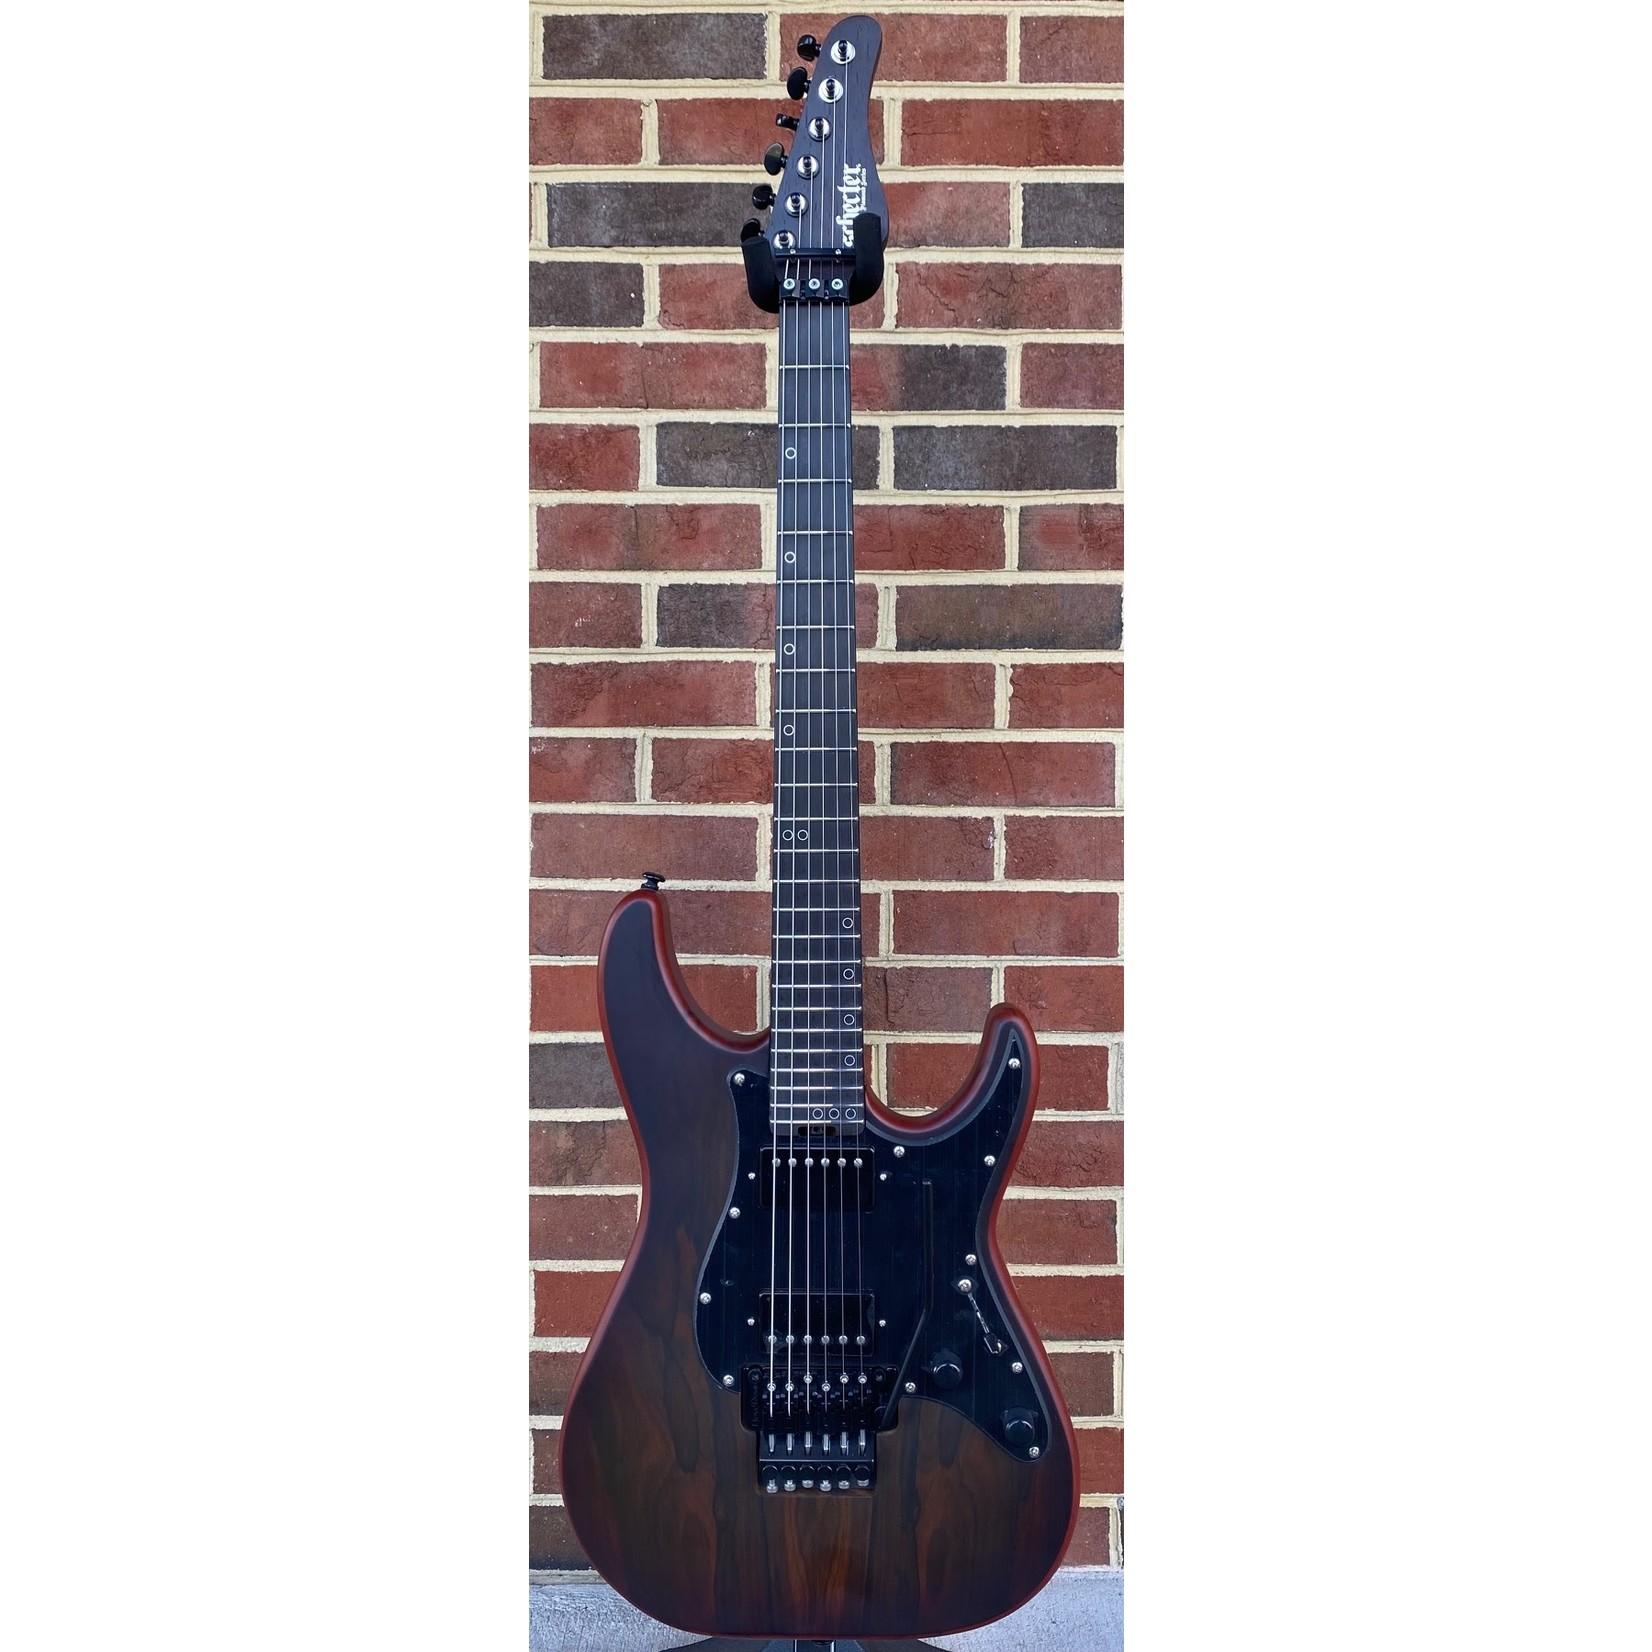 Schecter Guitar Research Schecter Sun Valley Super Shredder Exotic, Ziricote, Black Limba Body, Wenge Neck, Ebony Fretboard, Grover Tuners, Floyd Rose Trem